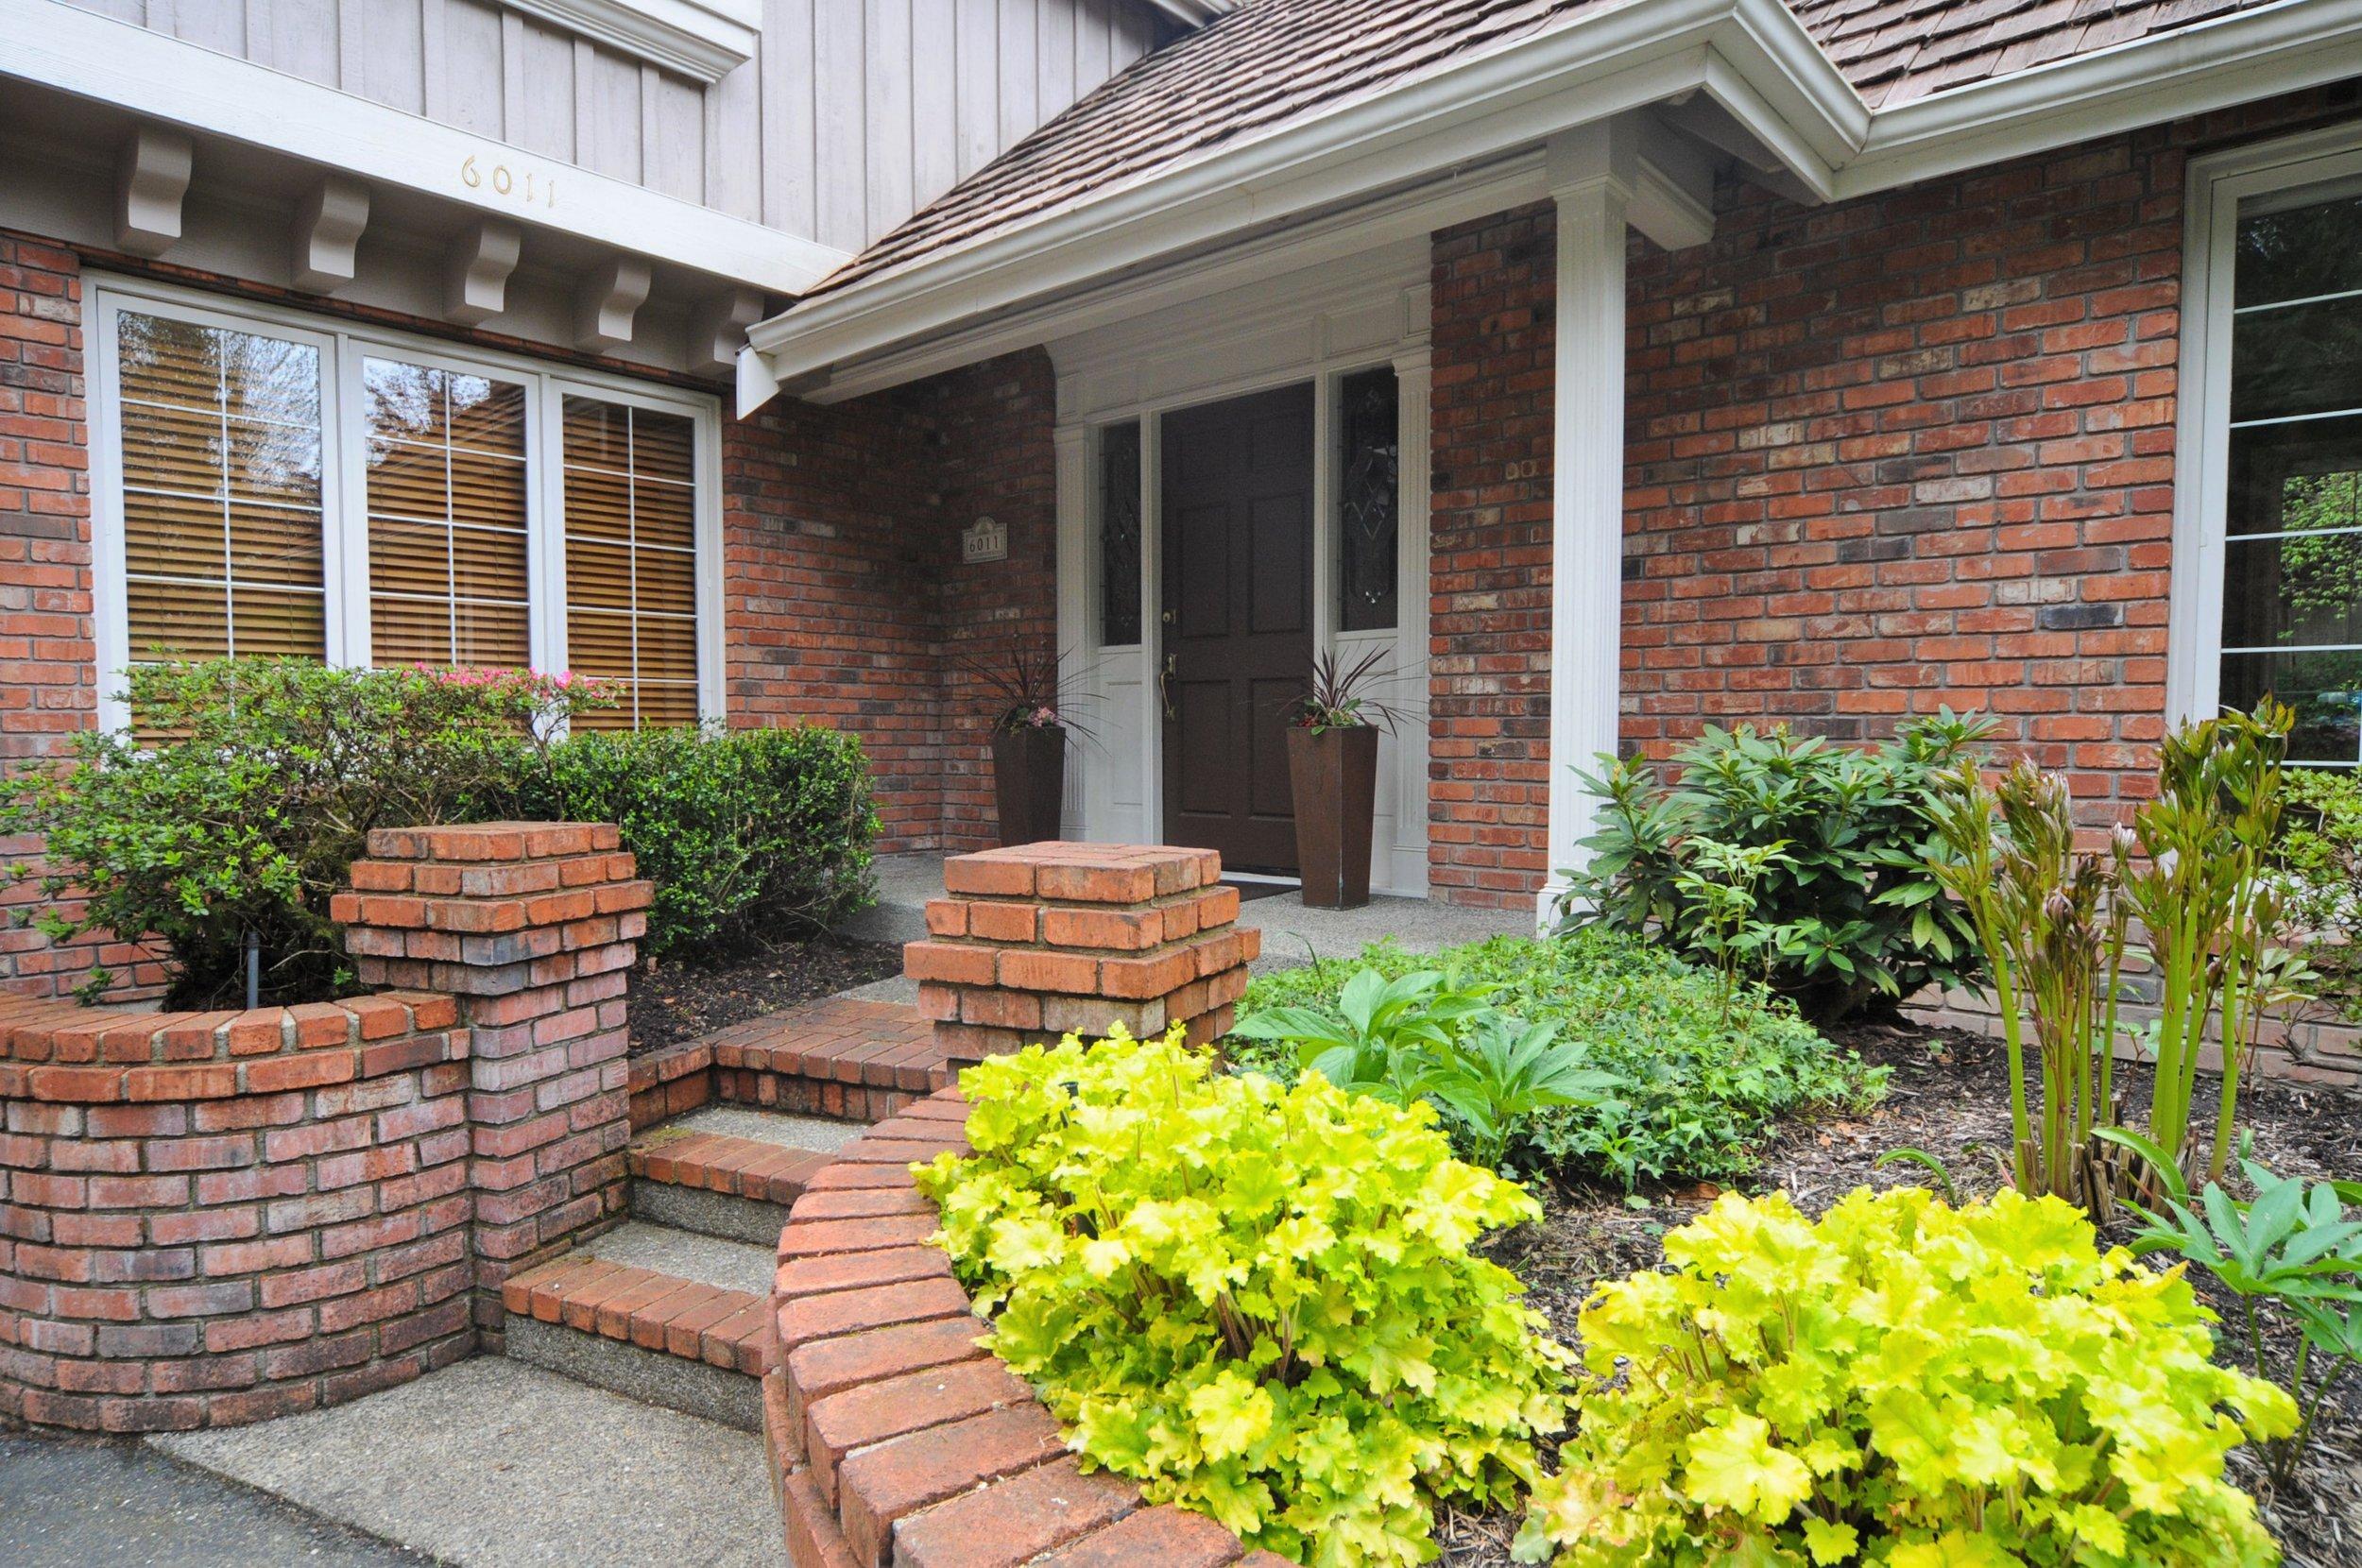 Sold-Redmond, Buchan Home